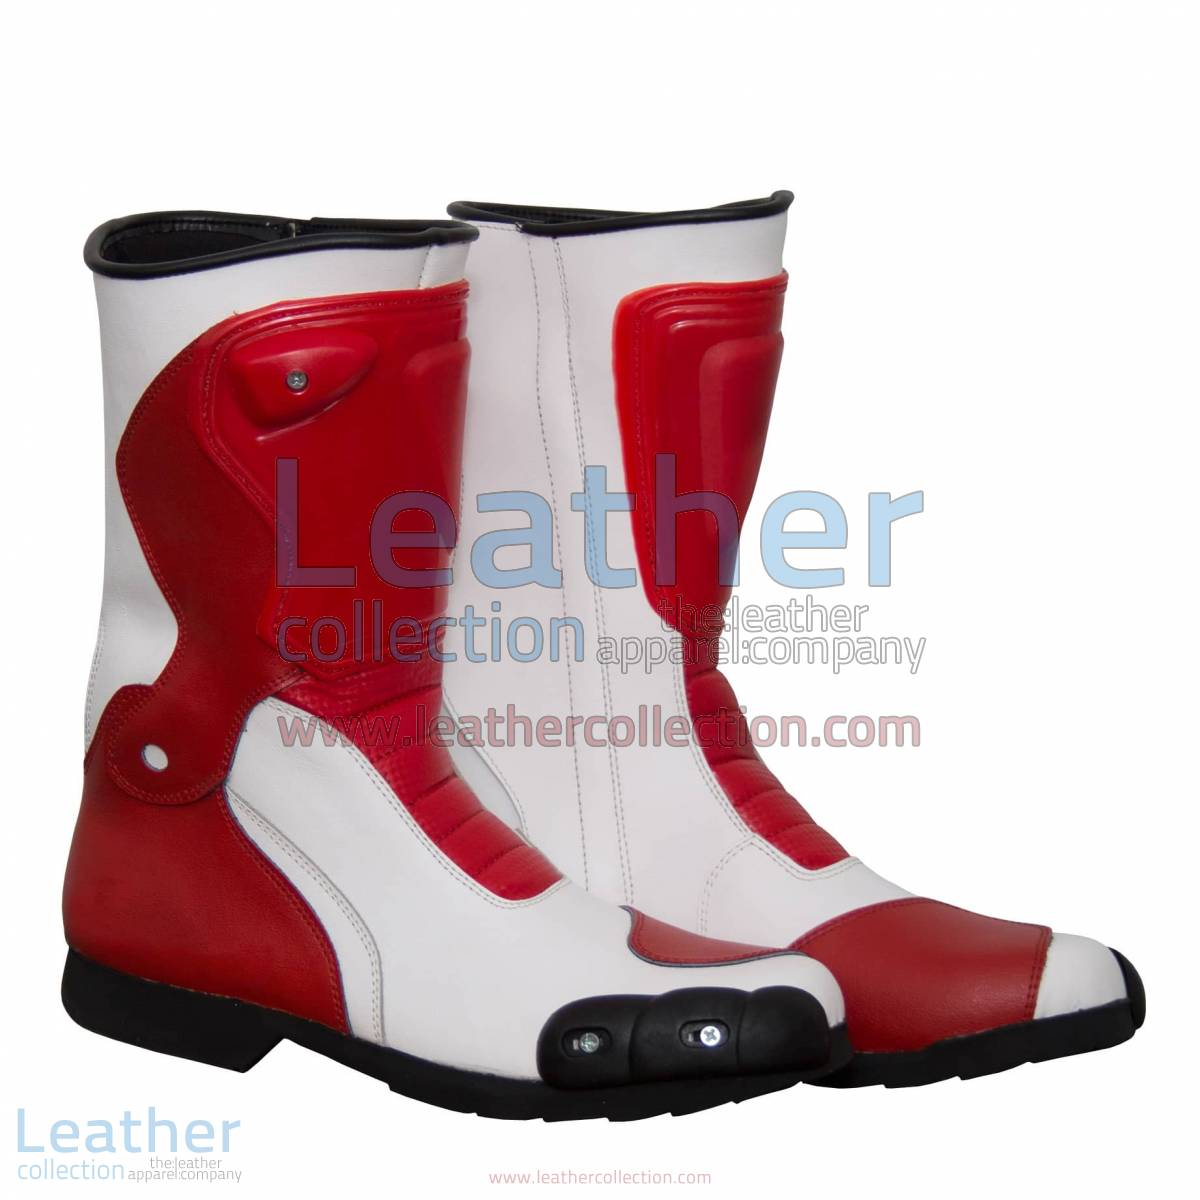 Marco Simoncelli Motorbike Riding Boots | riding boots,marco simoncelli